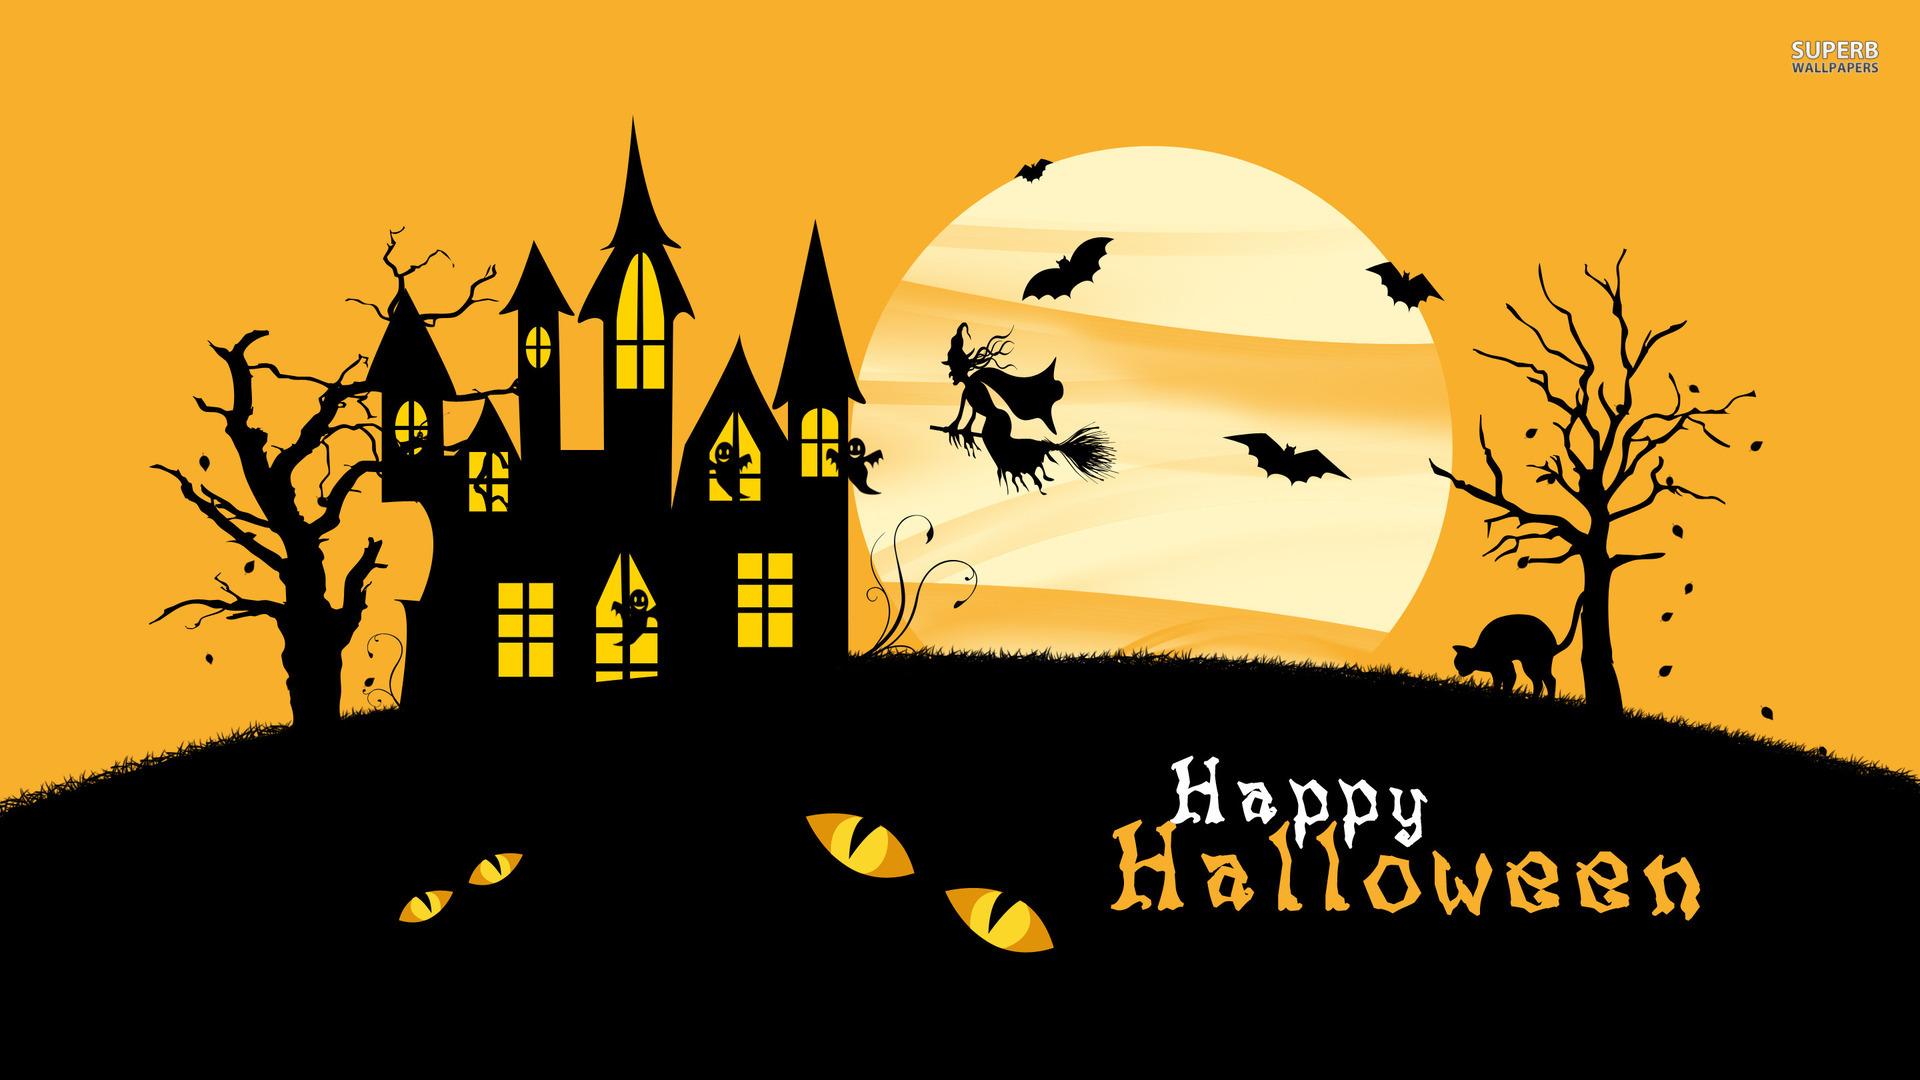 Desktop Wallpaper Happy Halloween h441606 Holidays HD Images 1920x1080